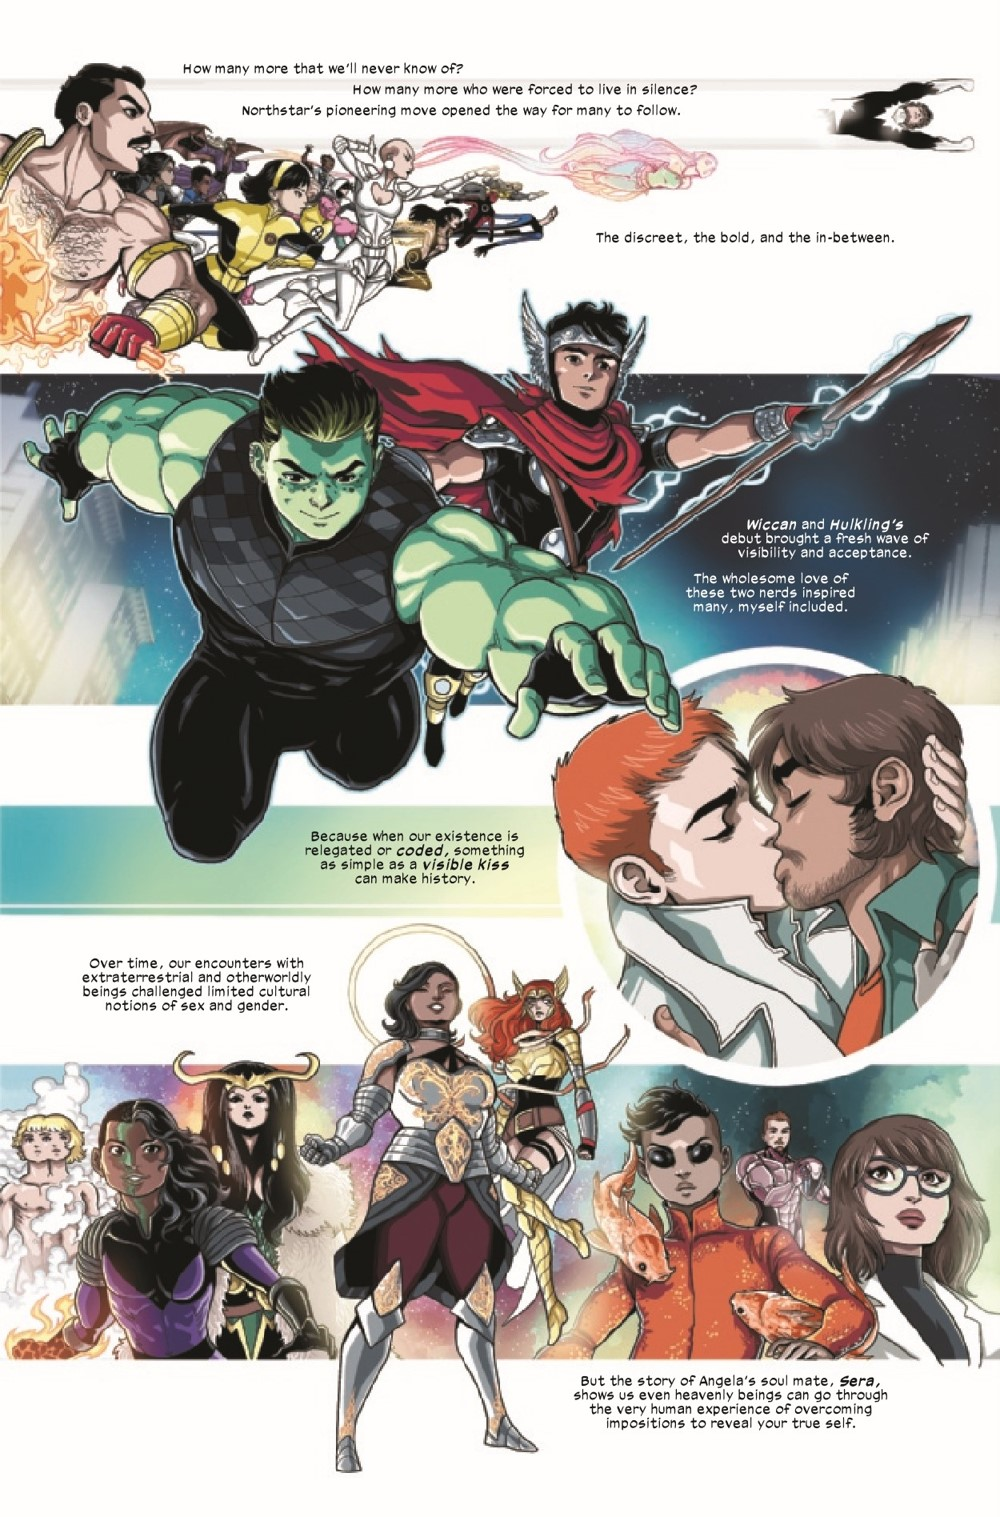 MARVOICESPRIDE2021001_Preview-05 ComicList Previews: MARVEL'S VOICES PRIDE #1